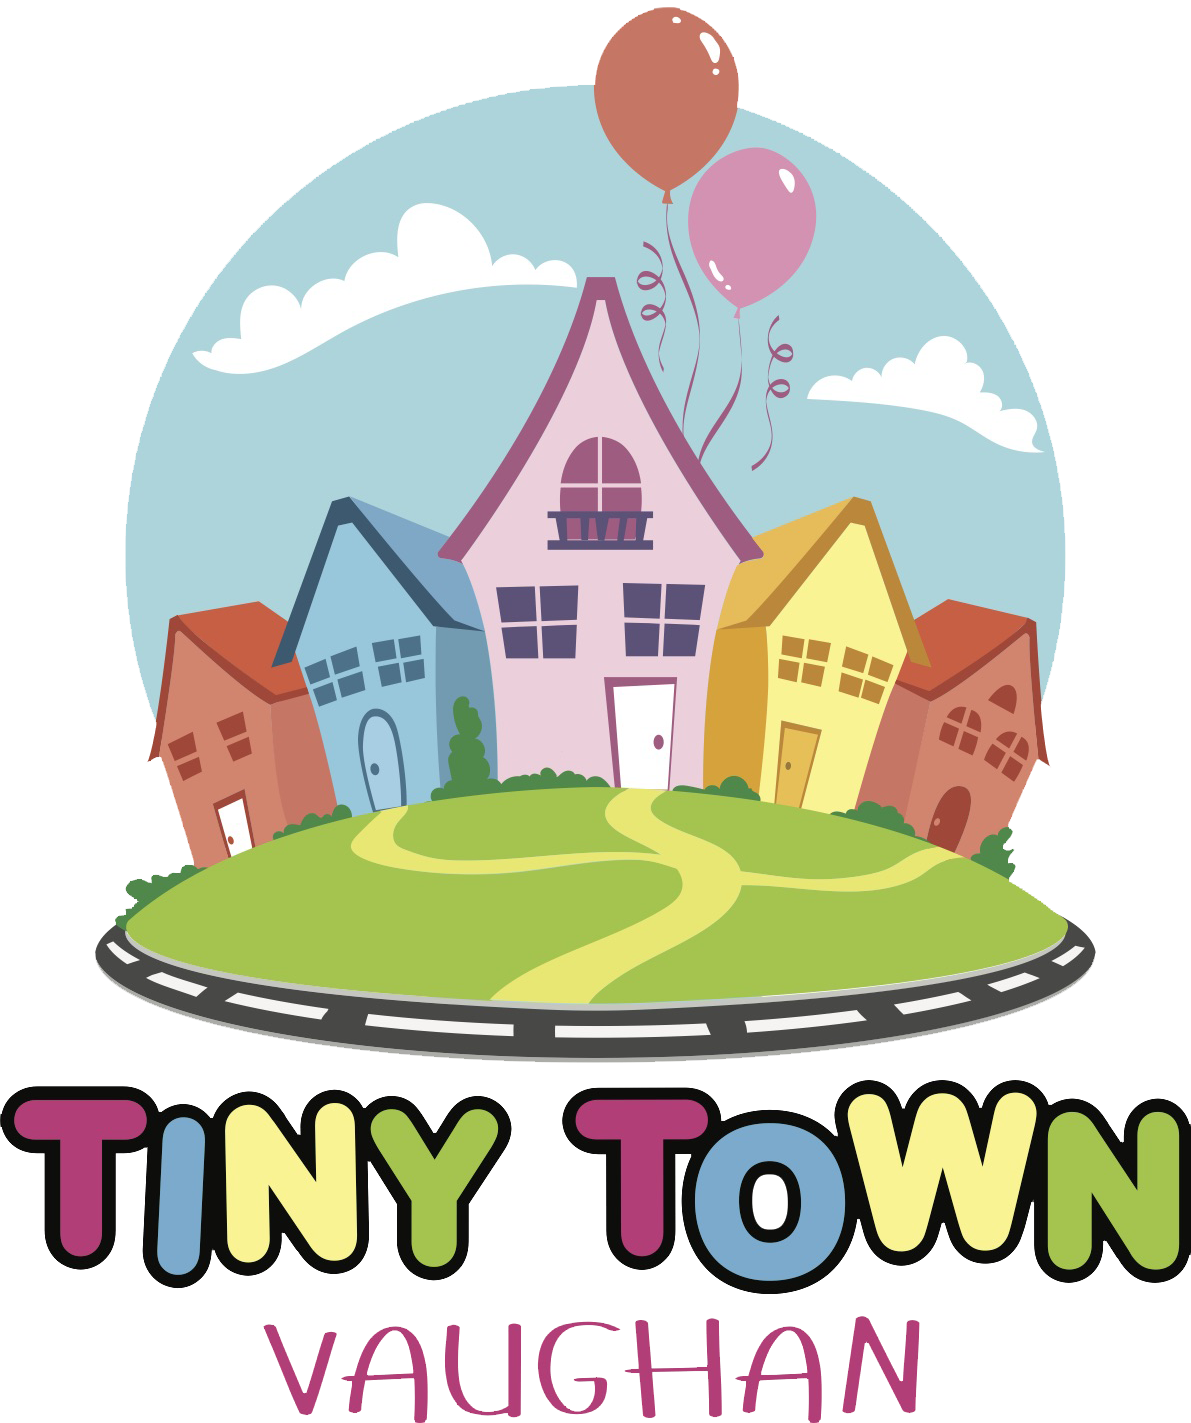 Tiny vaughan field trips. Neighborhood clipart town plaza